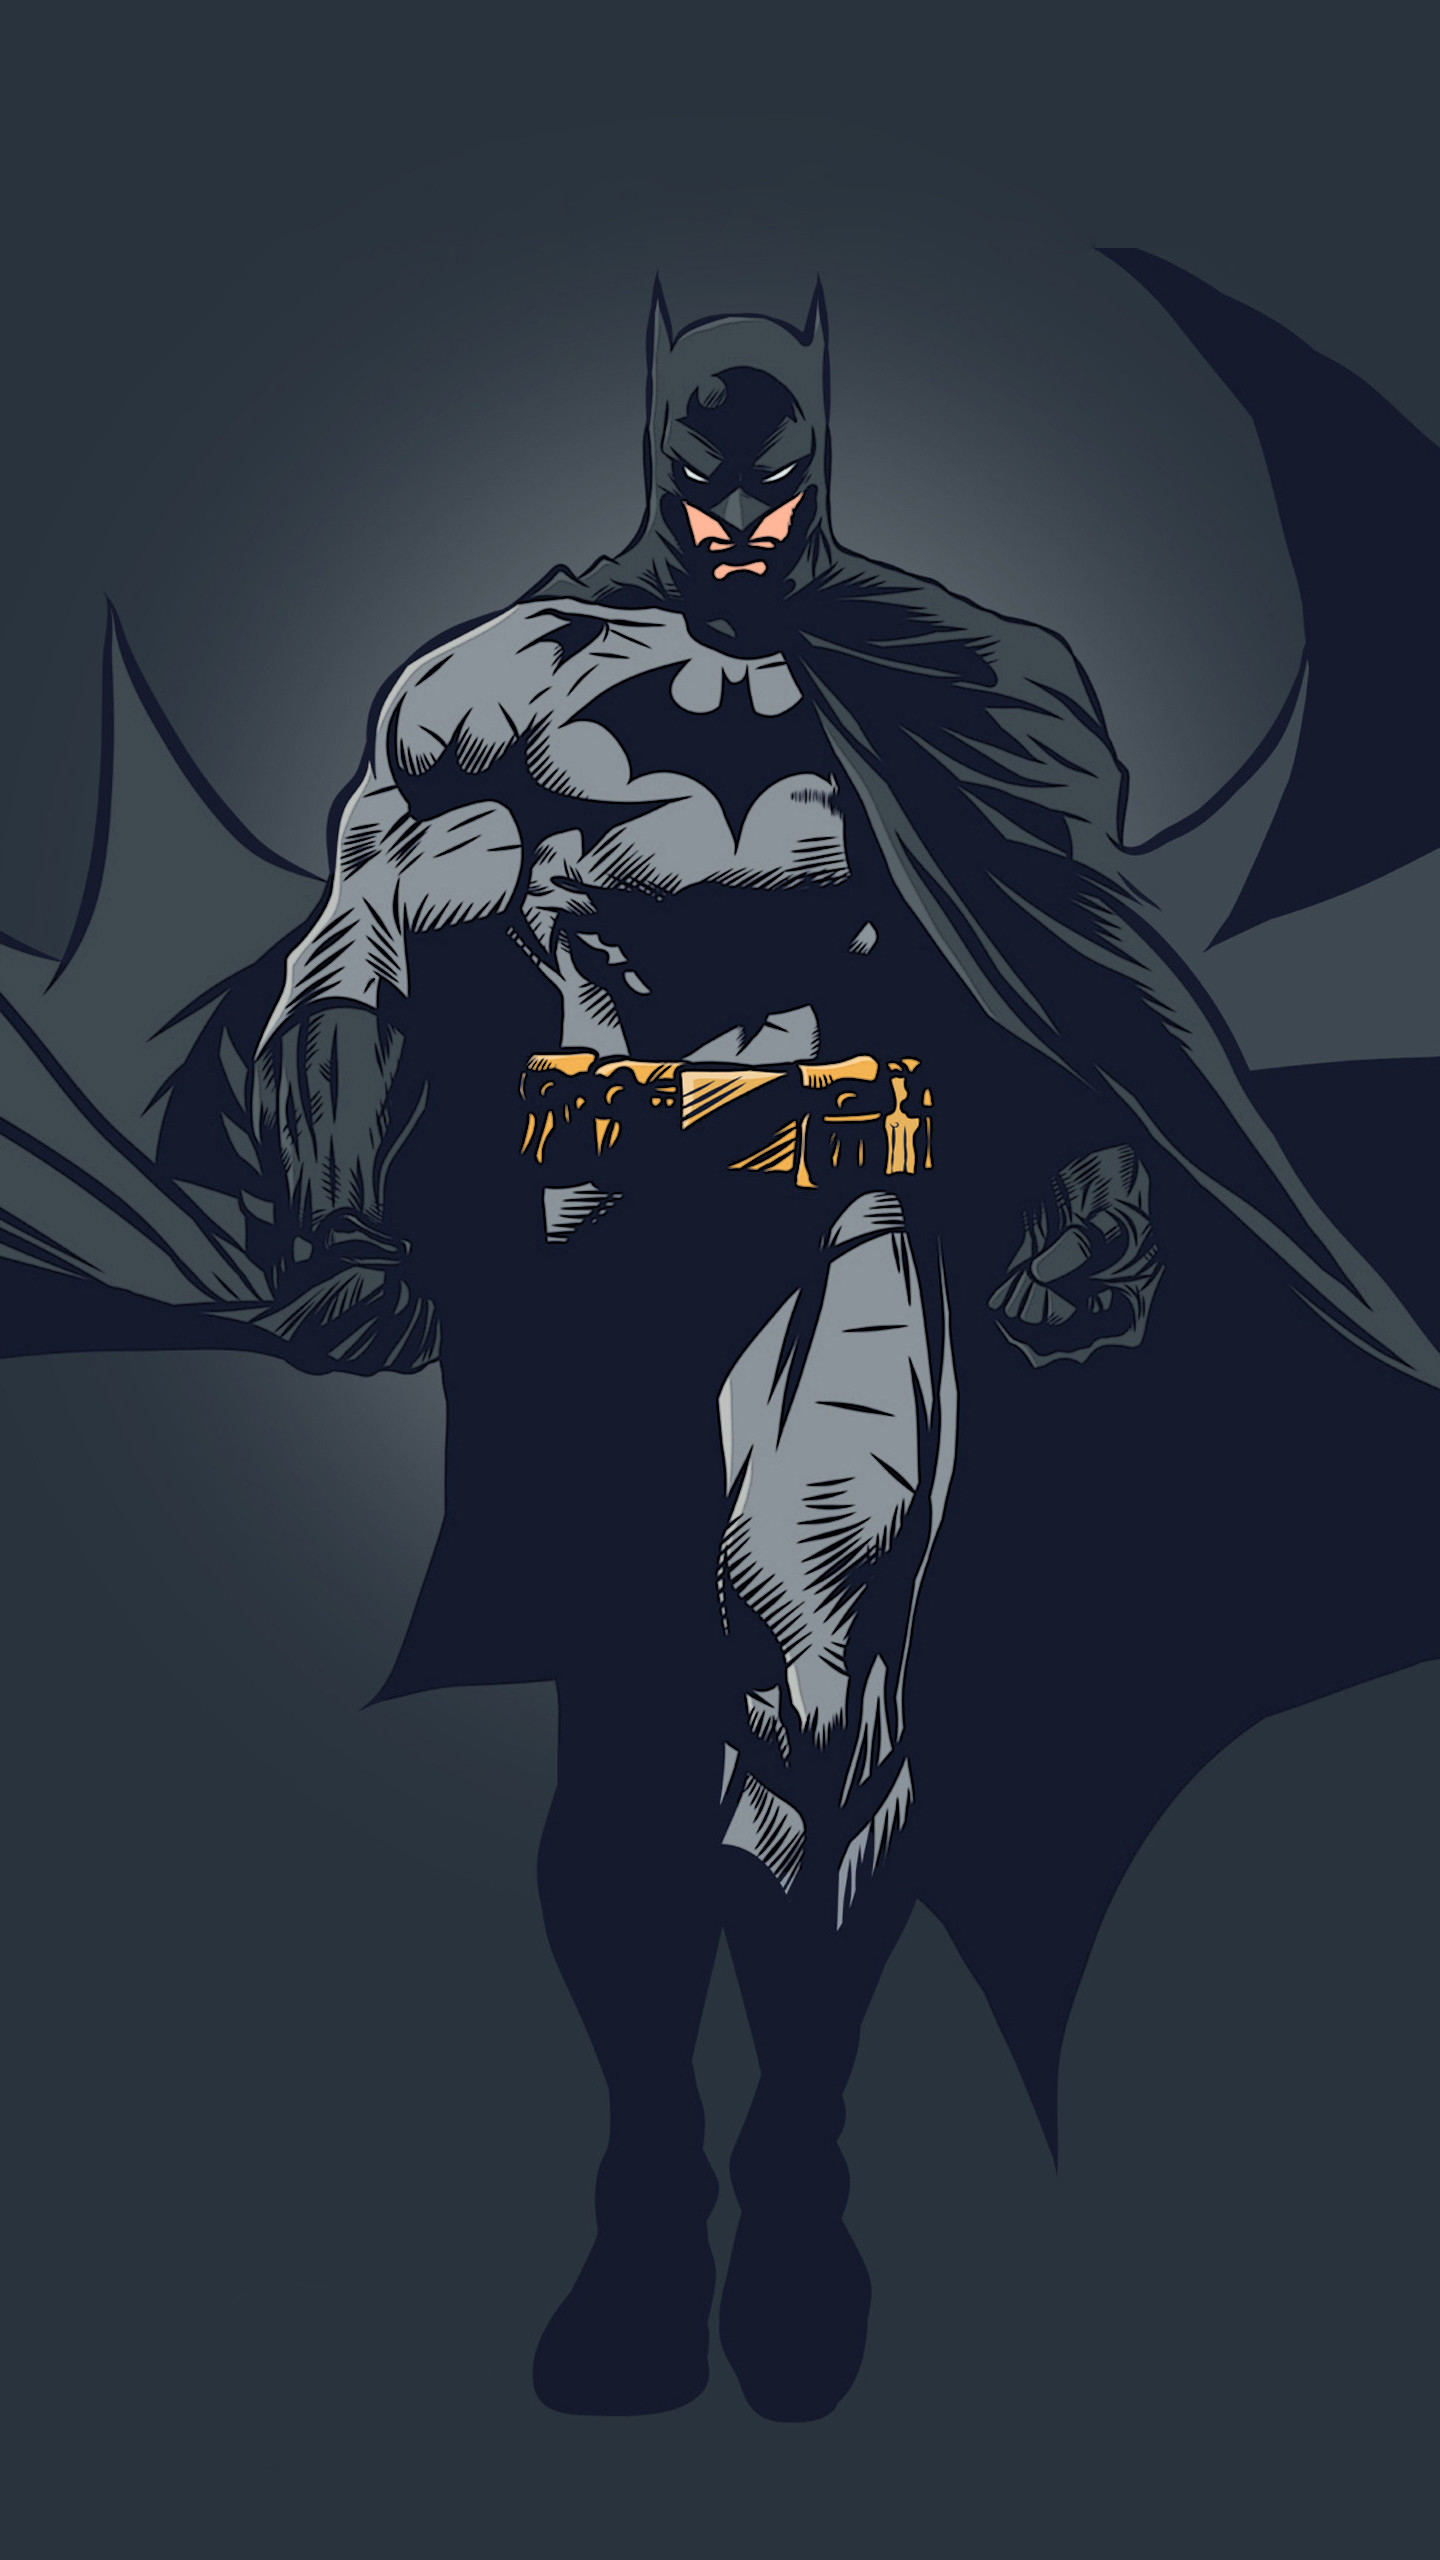 batman minimalist wallpaper (72+ images)